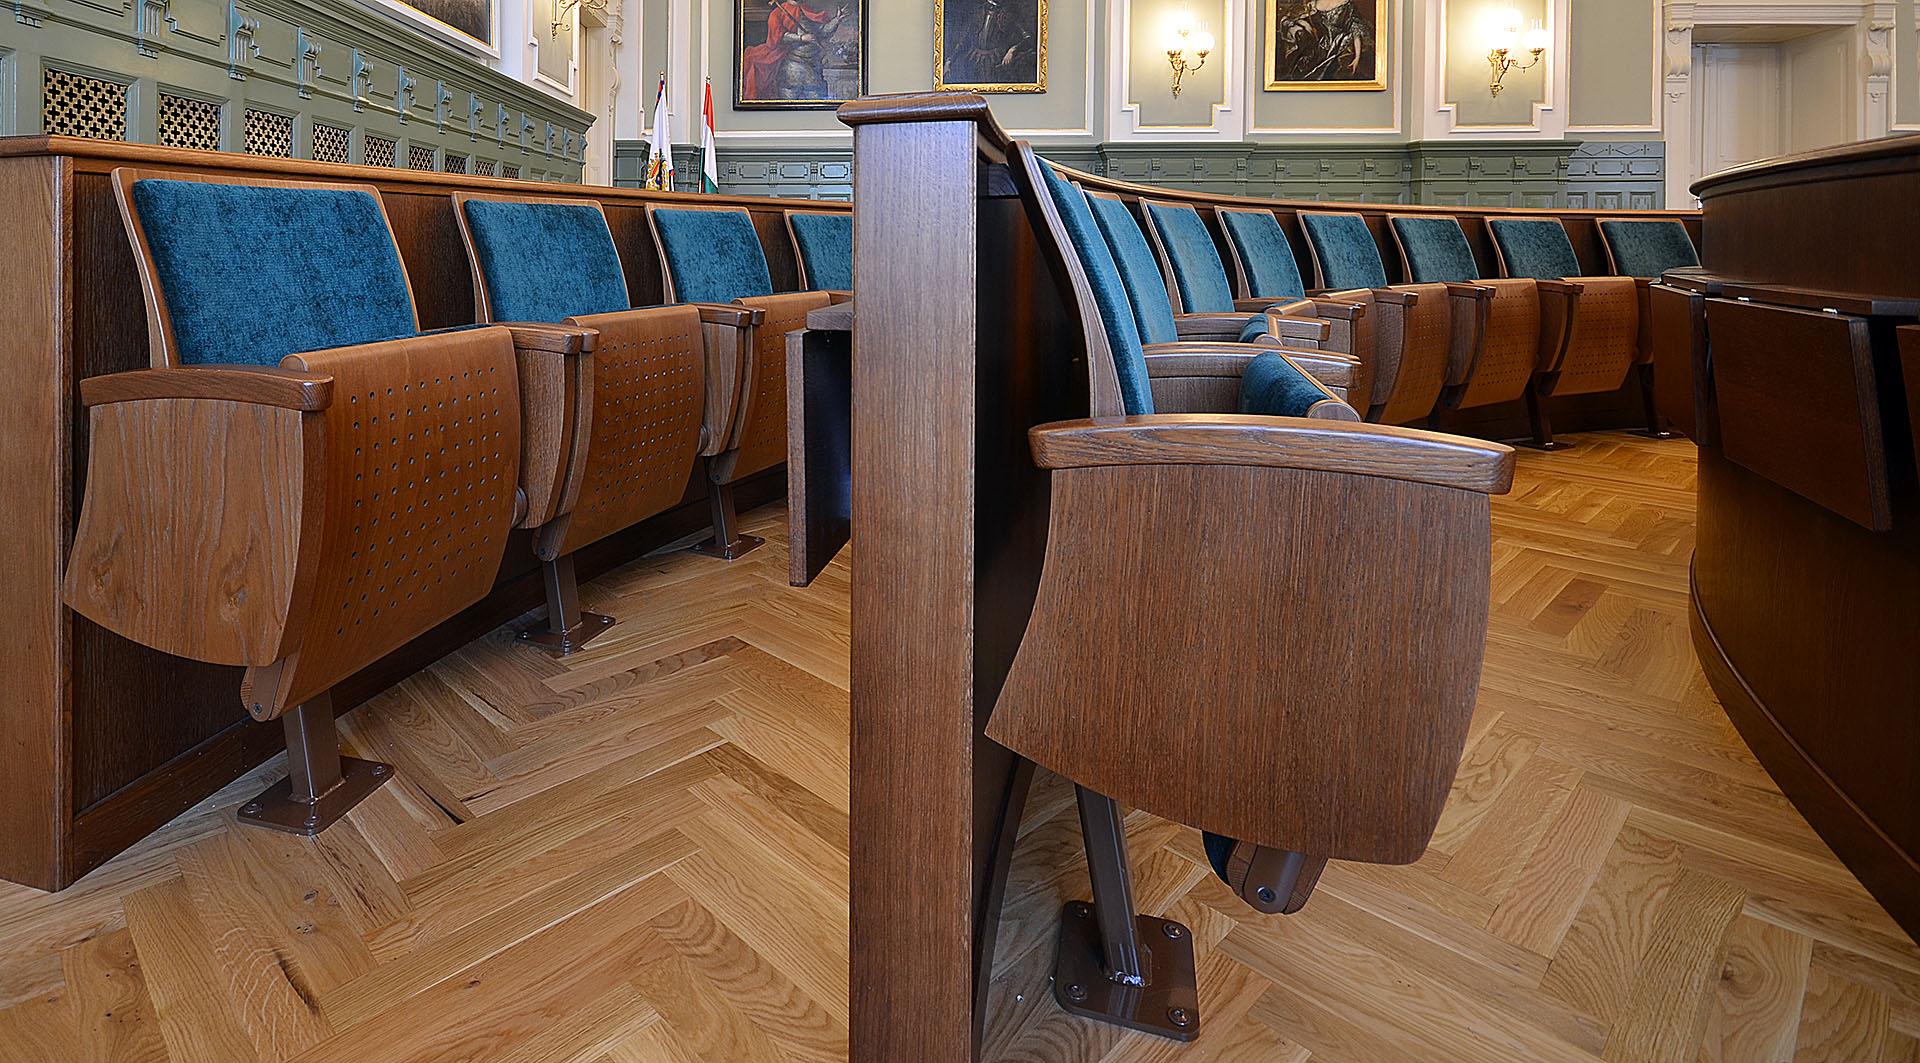 HU Györ Rathaus Festsaal 05 web